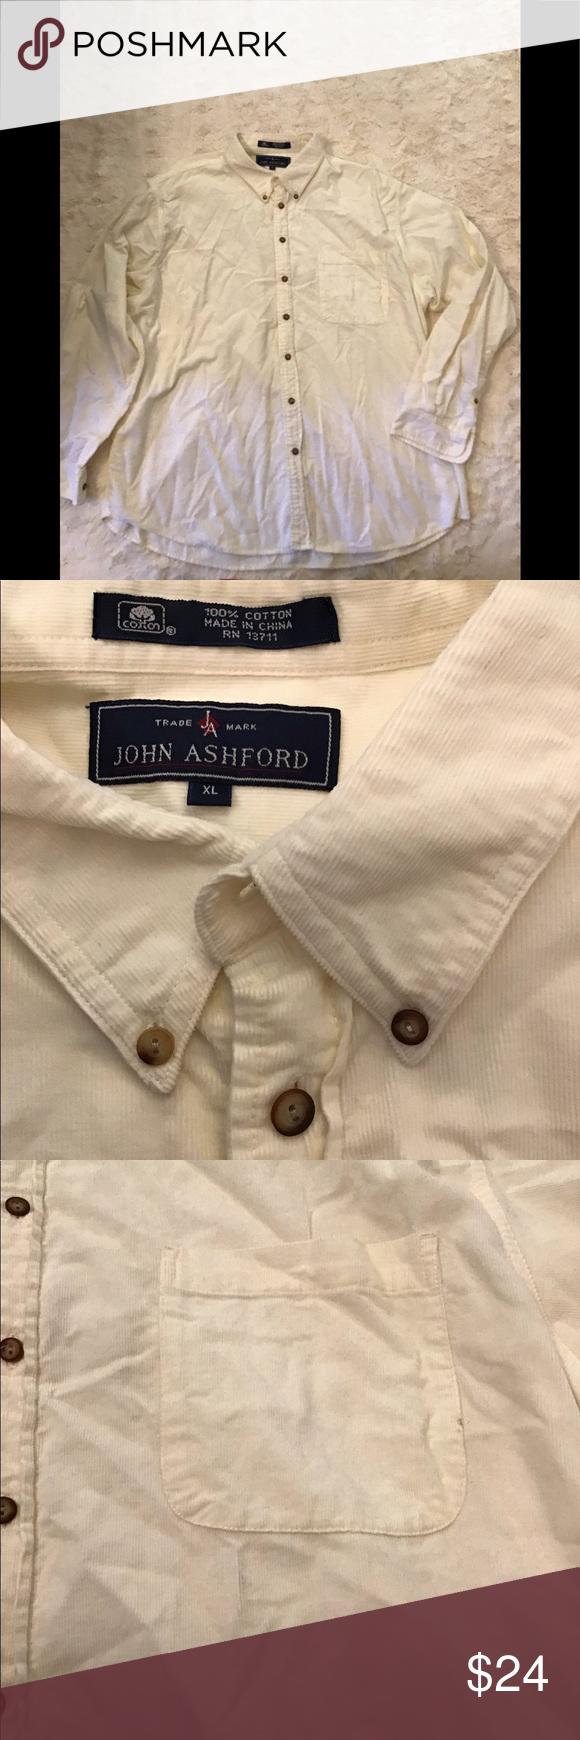 John Ashford Xl Men S Cream Corduroy Shirt John Ashford Trade Mark Xl Men S Cream Corduroy Shirt Small Spot On Pocket Smoke Free And In 2020 Corduroy Shirts Fashion